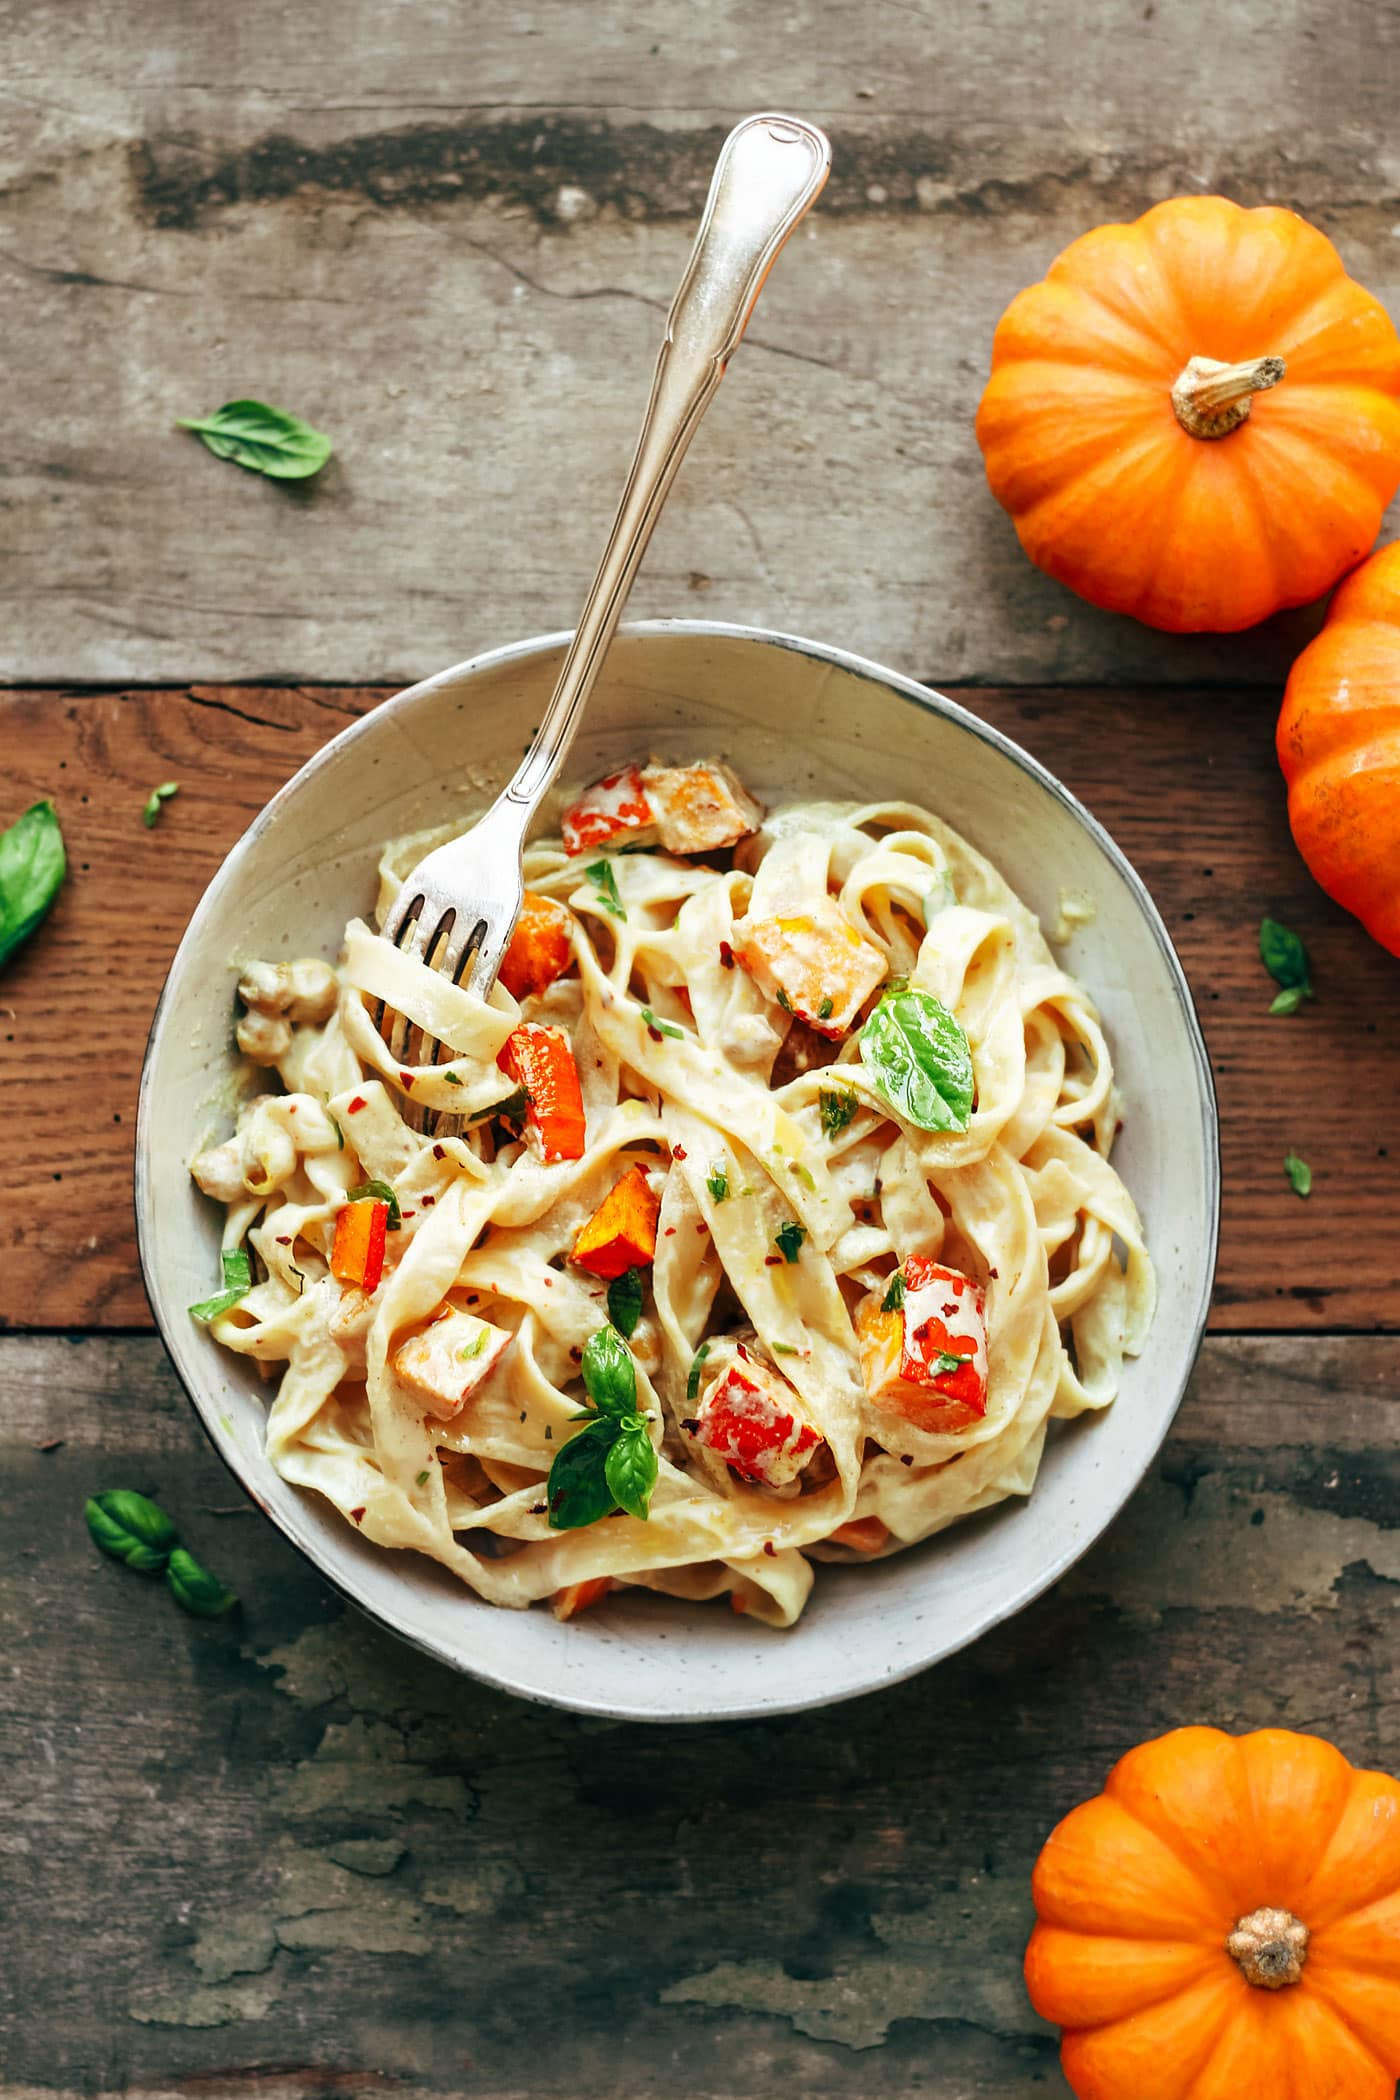 Pumpkin & Chickpea Pasta with Creamy Miso Sauce (Vegan + GF)